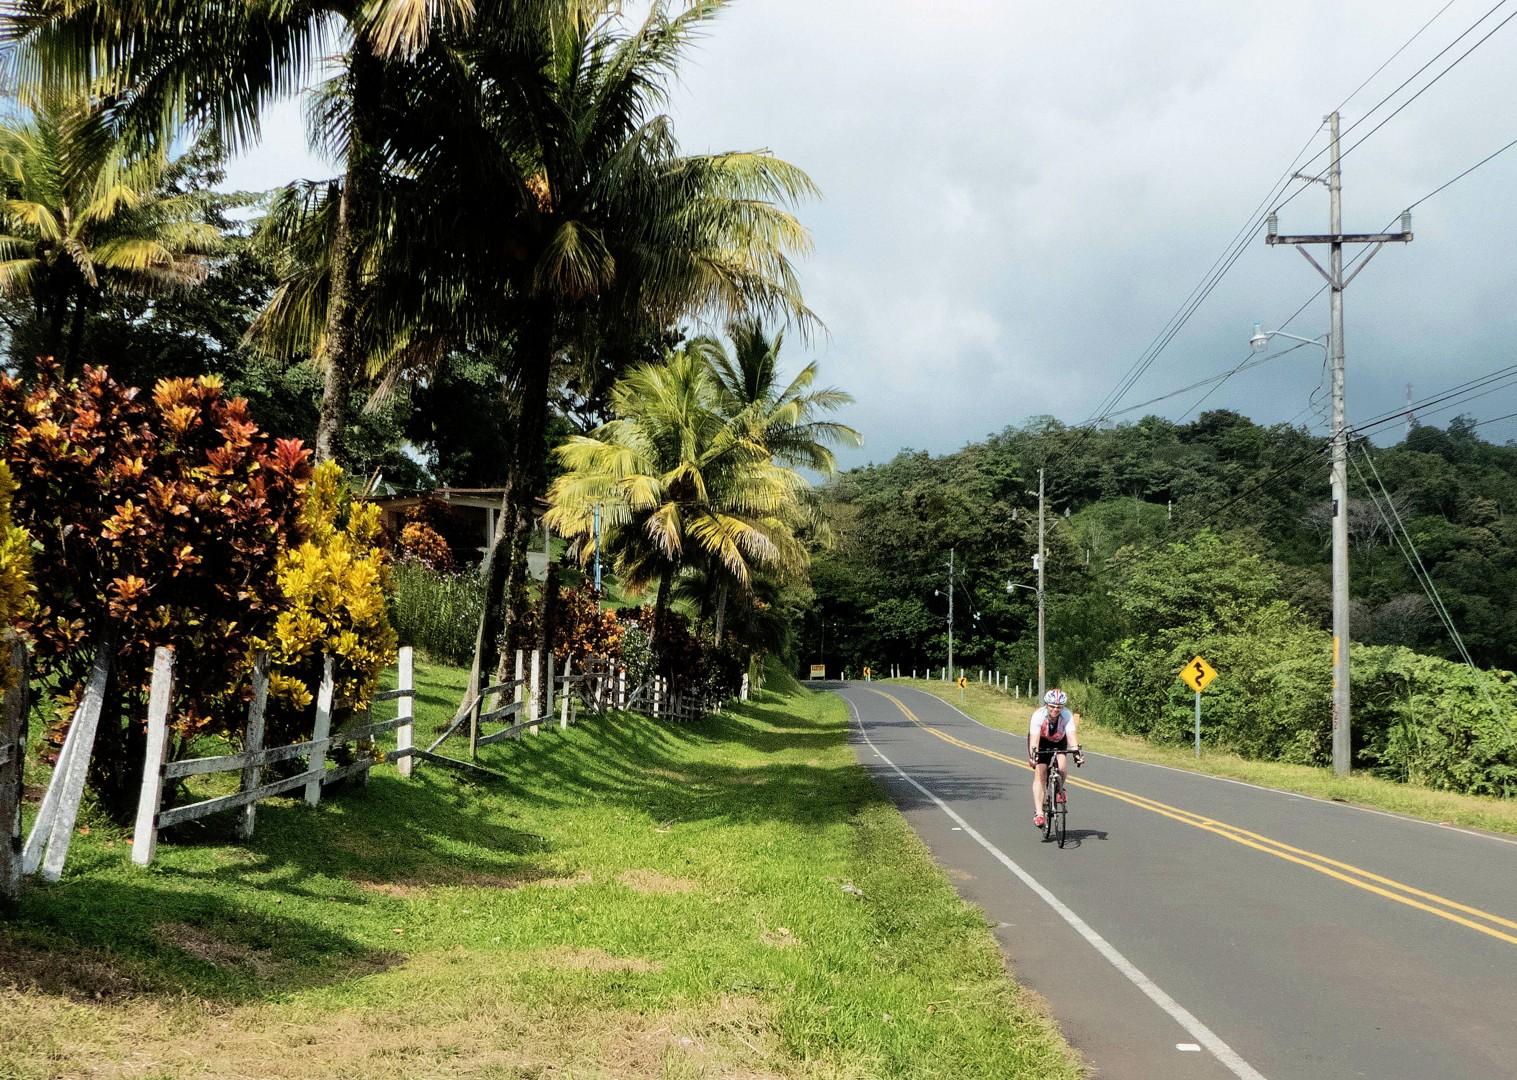 central-america-costa-rica-guided-road-cycling-holiday-ruta-de-los-volcanes.jpg - Costa Rica - Ruta de los Volcanes - Road Cycling